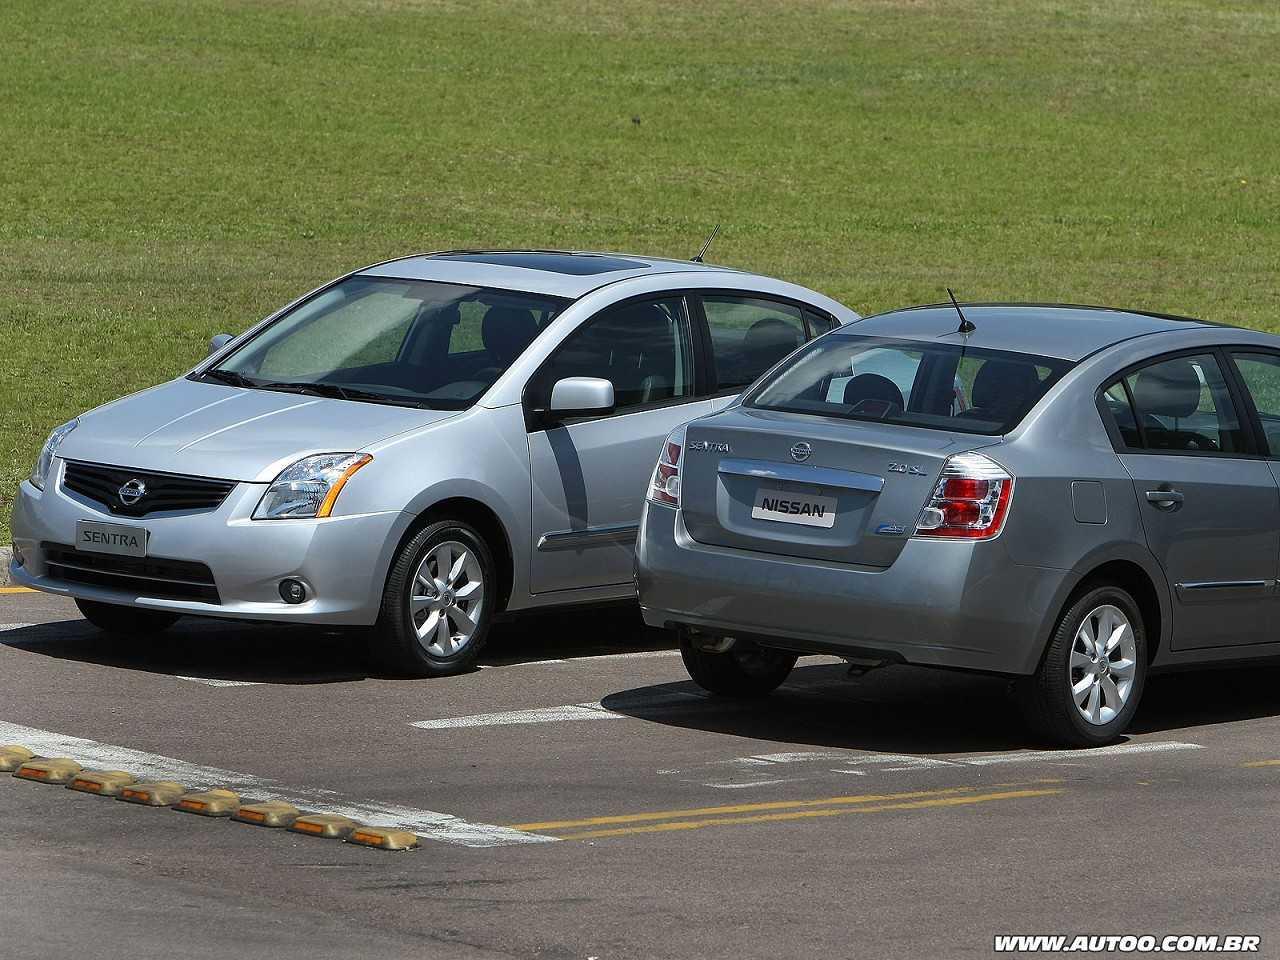 NissanSentra 2010 - outros